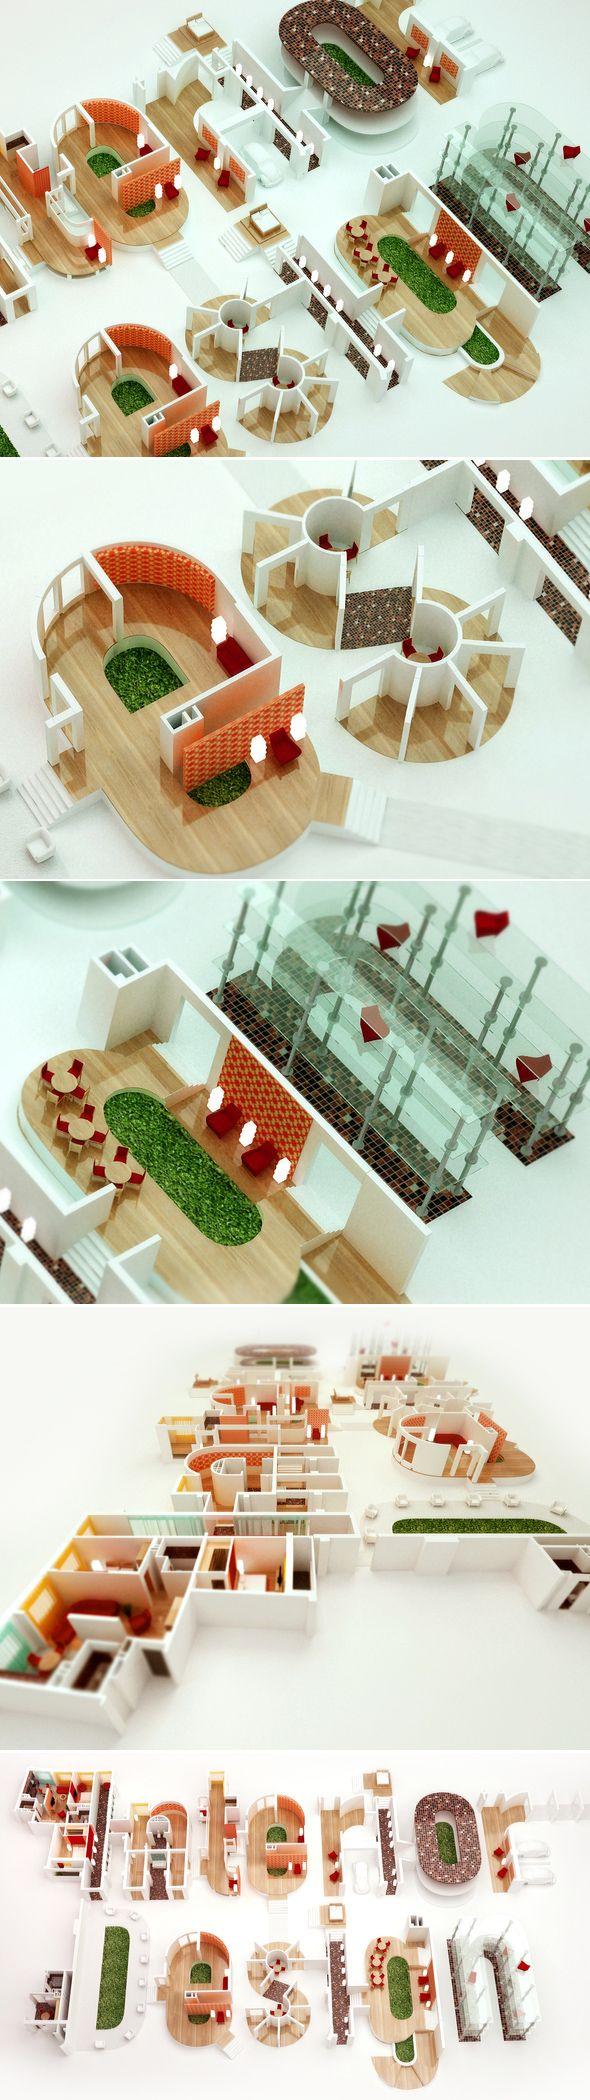 25+ trending Interior design sketches ideas on Pinterest ...